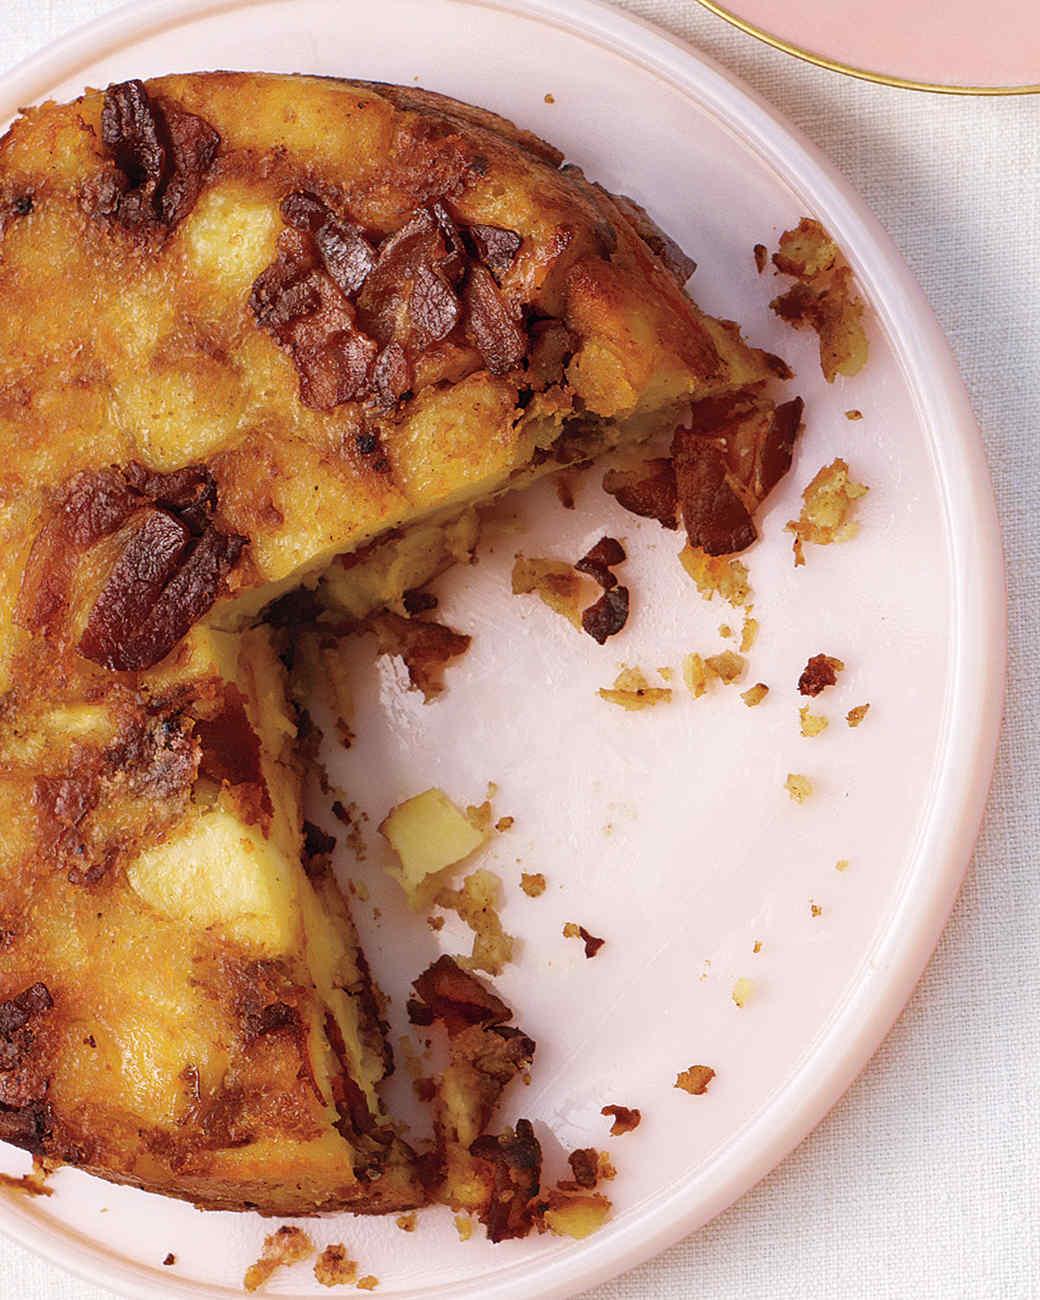 potato-bacon-cake-0511med106942.jpg